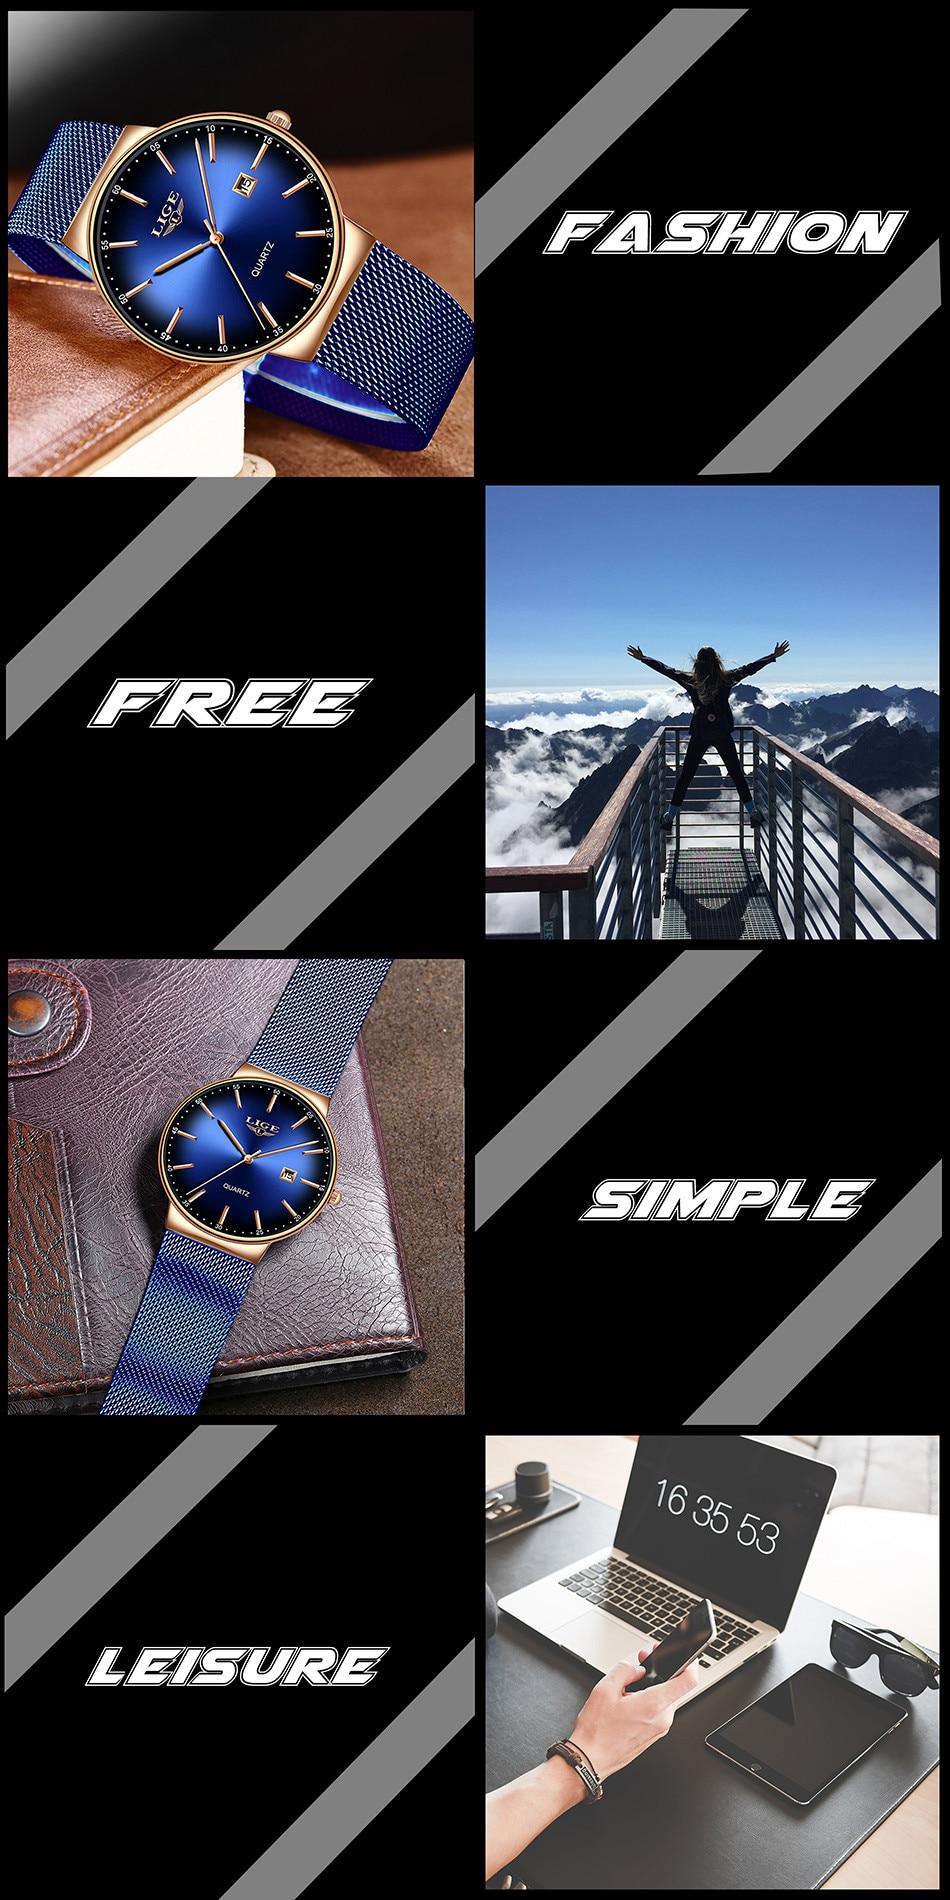 HTB1DtUlQSzqK1RjSZFjq6zlCFXaU LIGE New Mens Watches Top Brand Luxury Fashion Mesh Belt Watch Men Waterproof Wrist Watch Analog Quartz Clock erkek kol saati